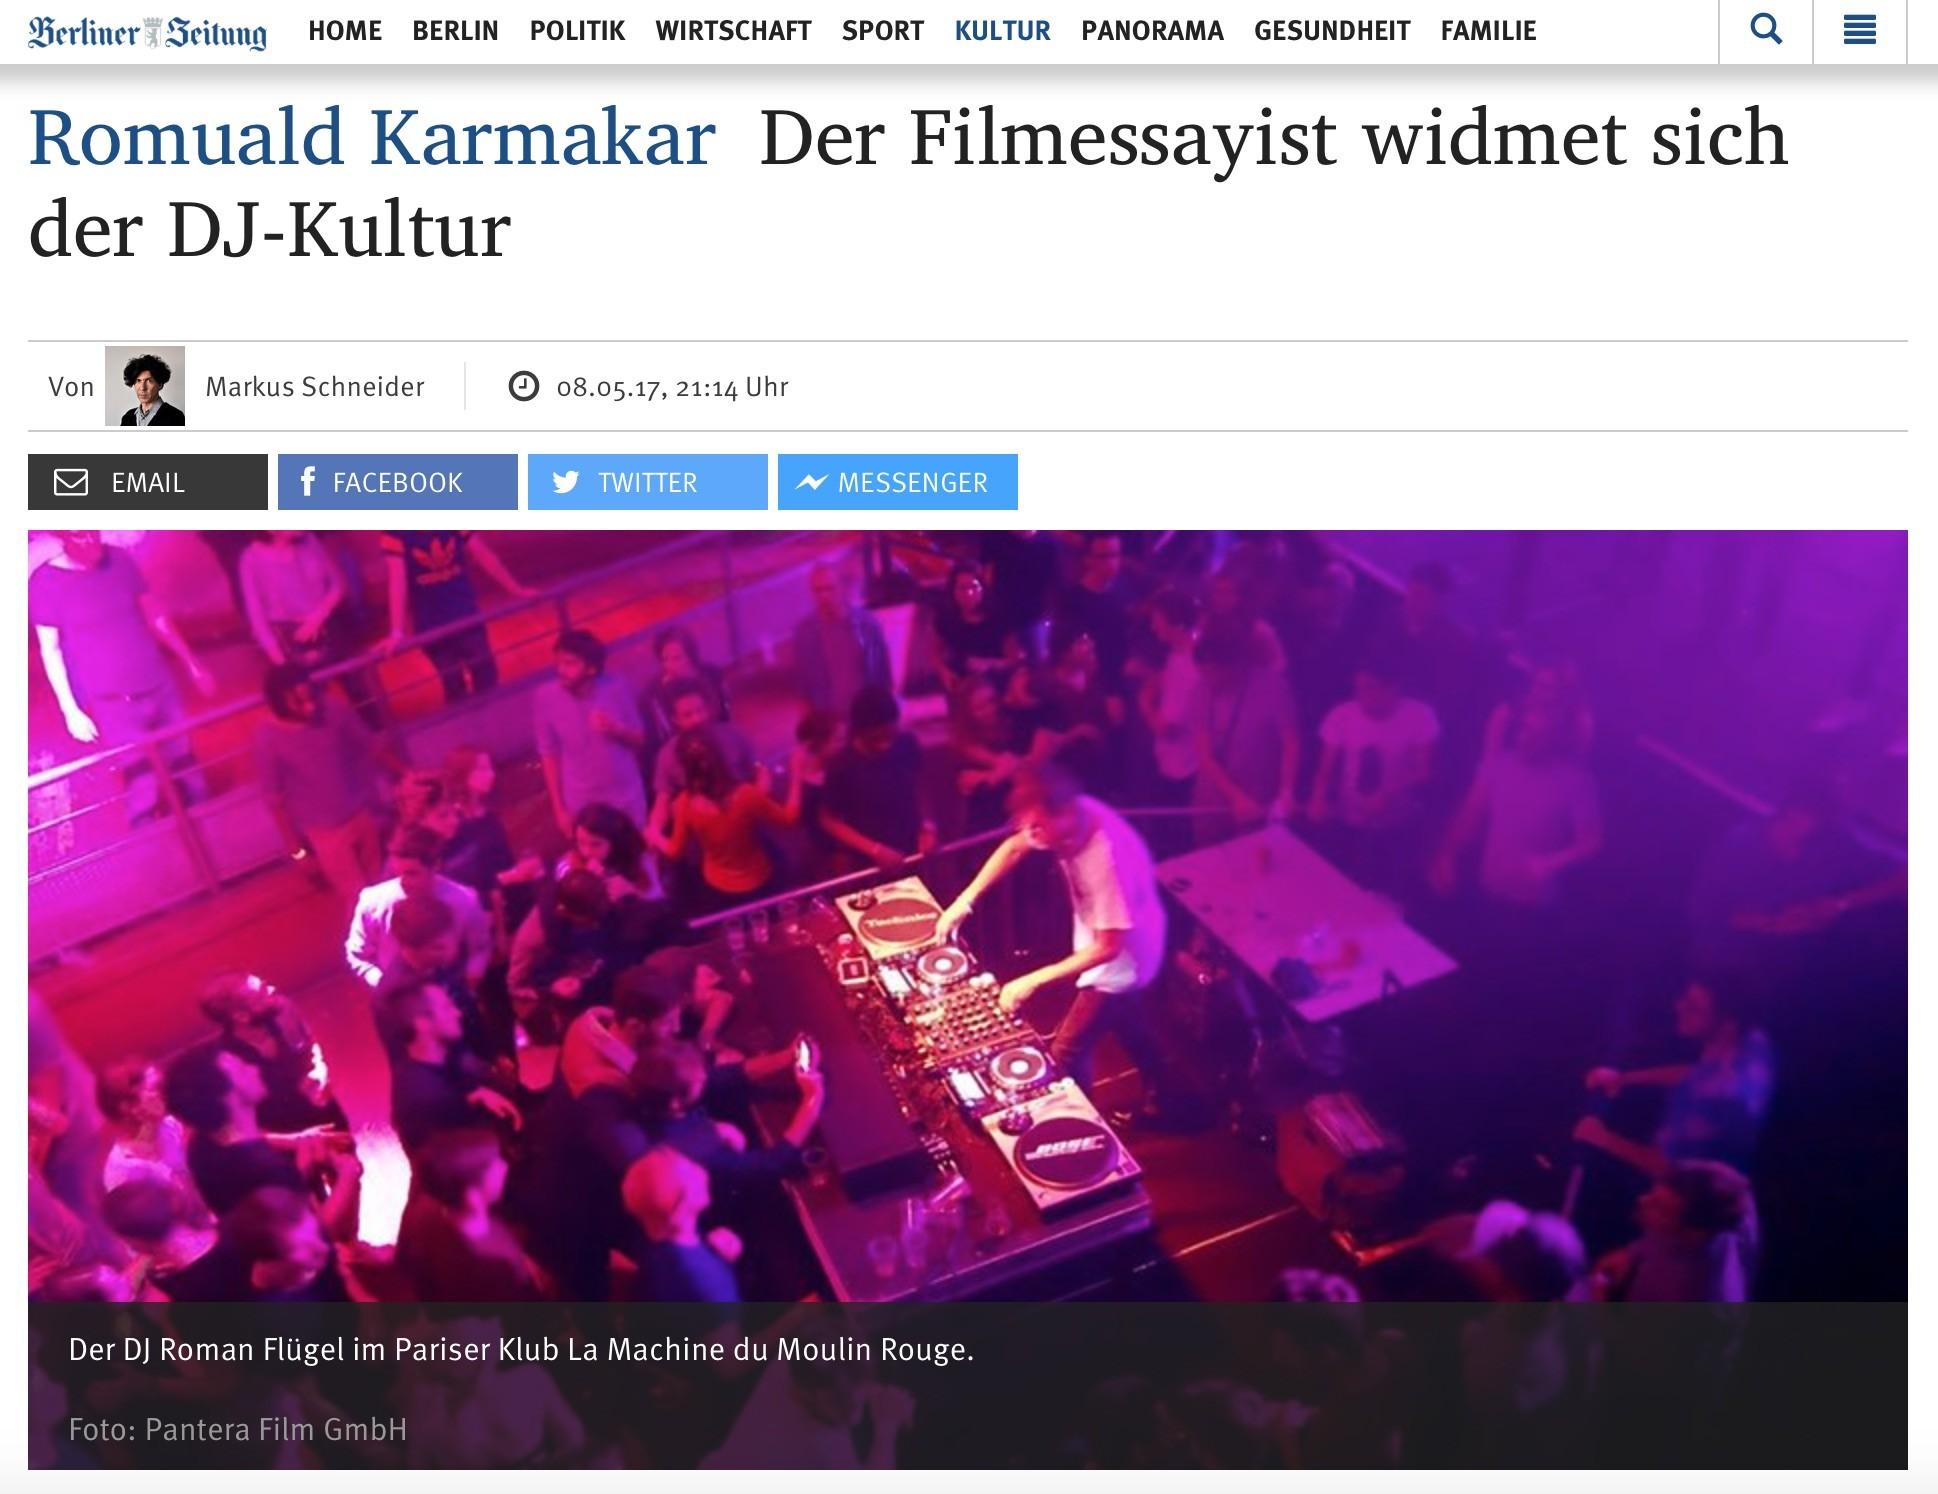 Copy of Romuald Karmakar: Der Filmessayist widmet sich der DJ-Kultur